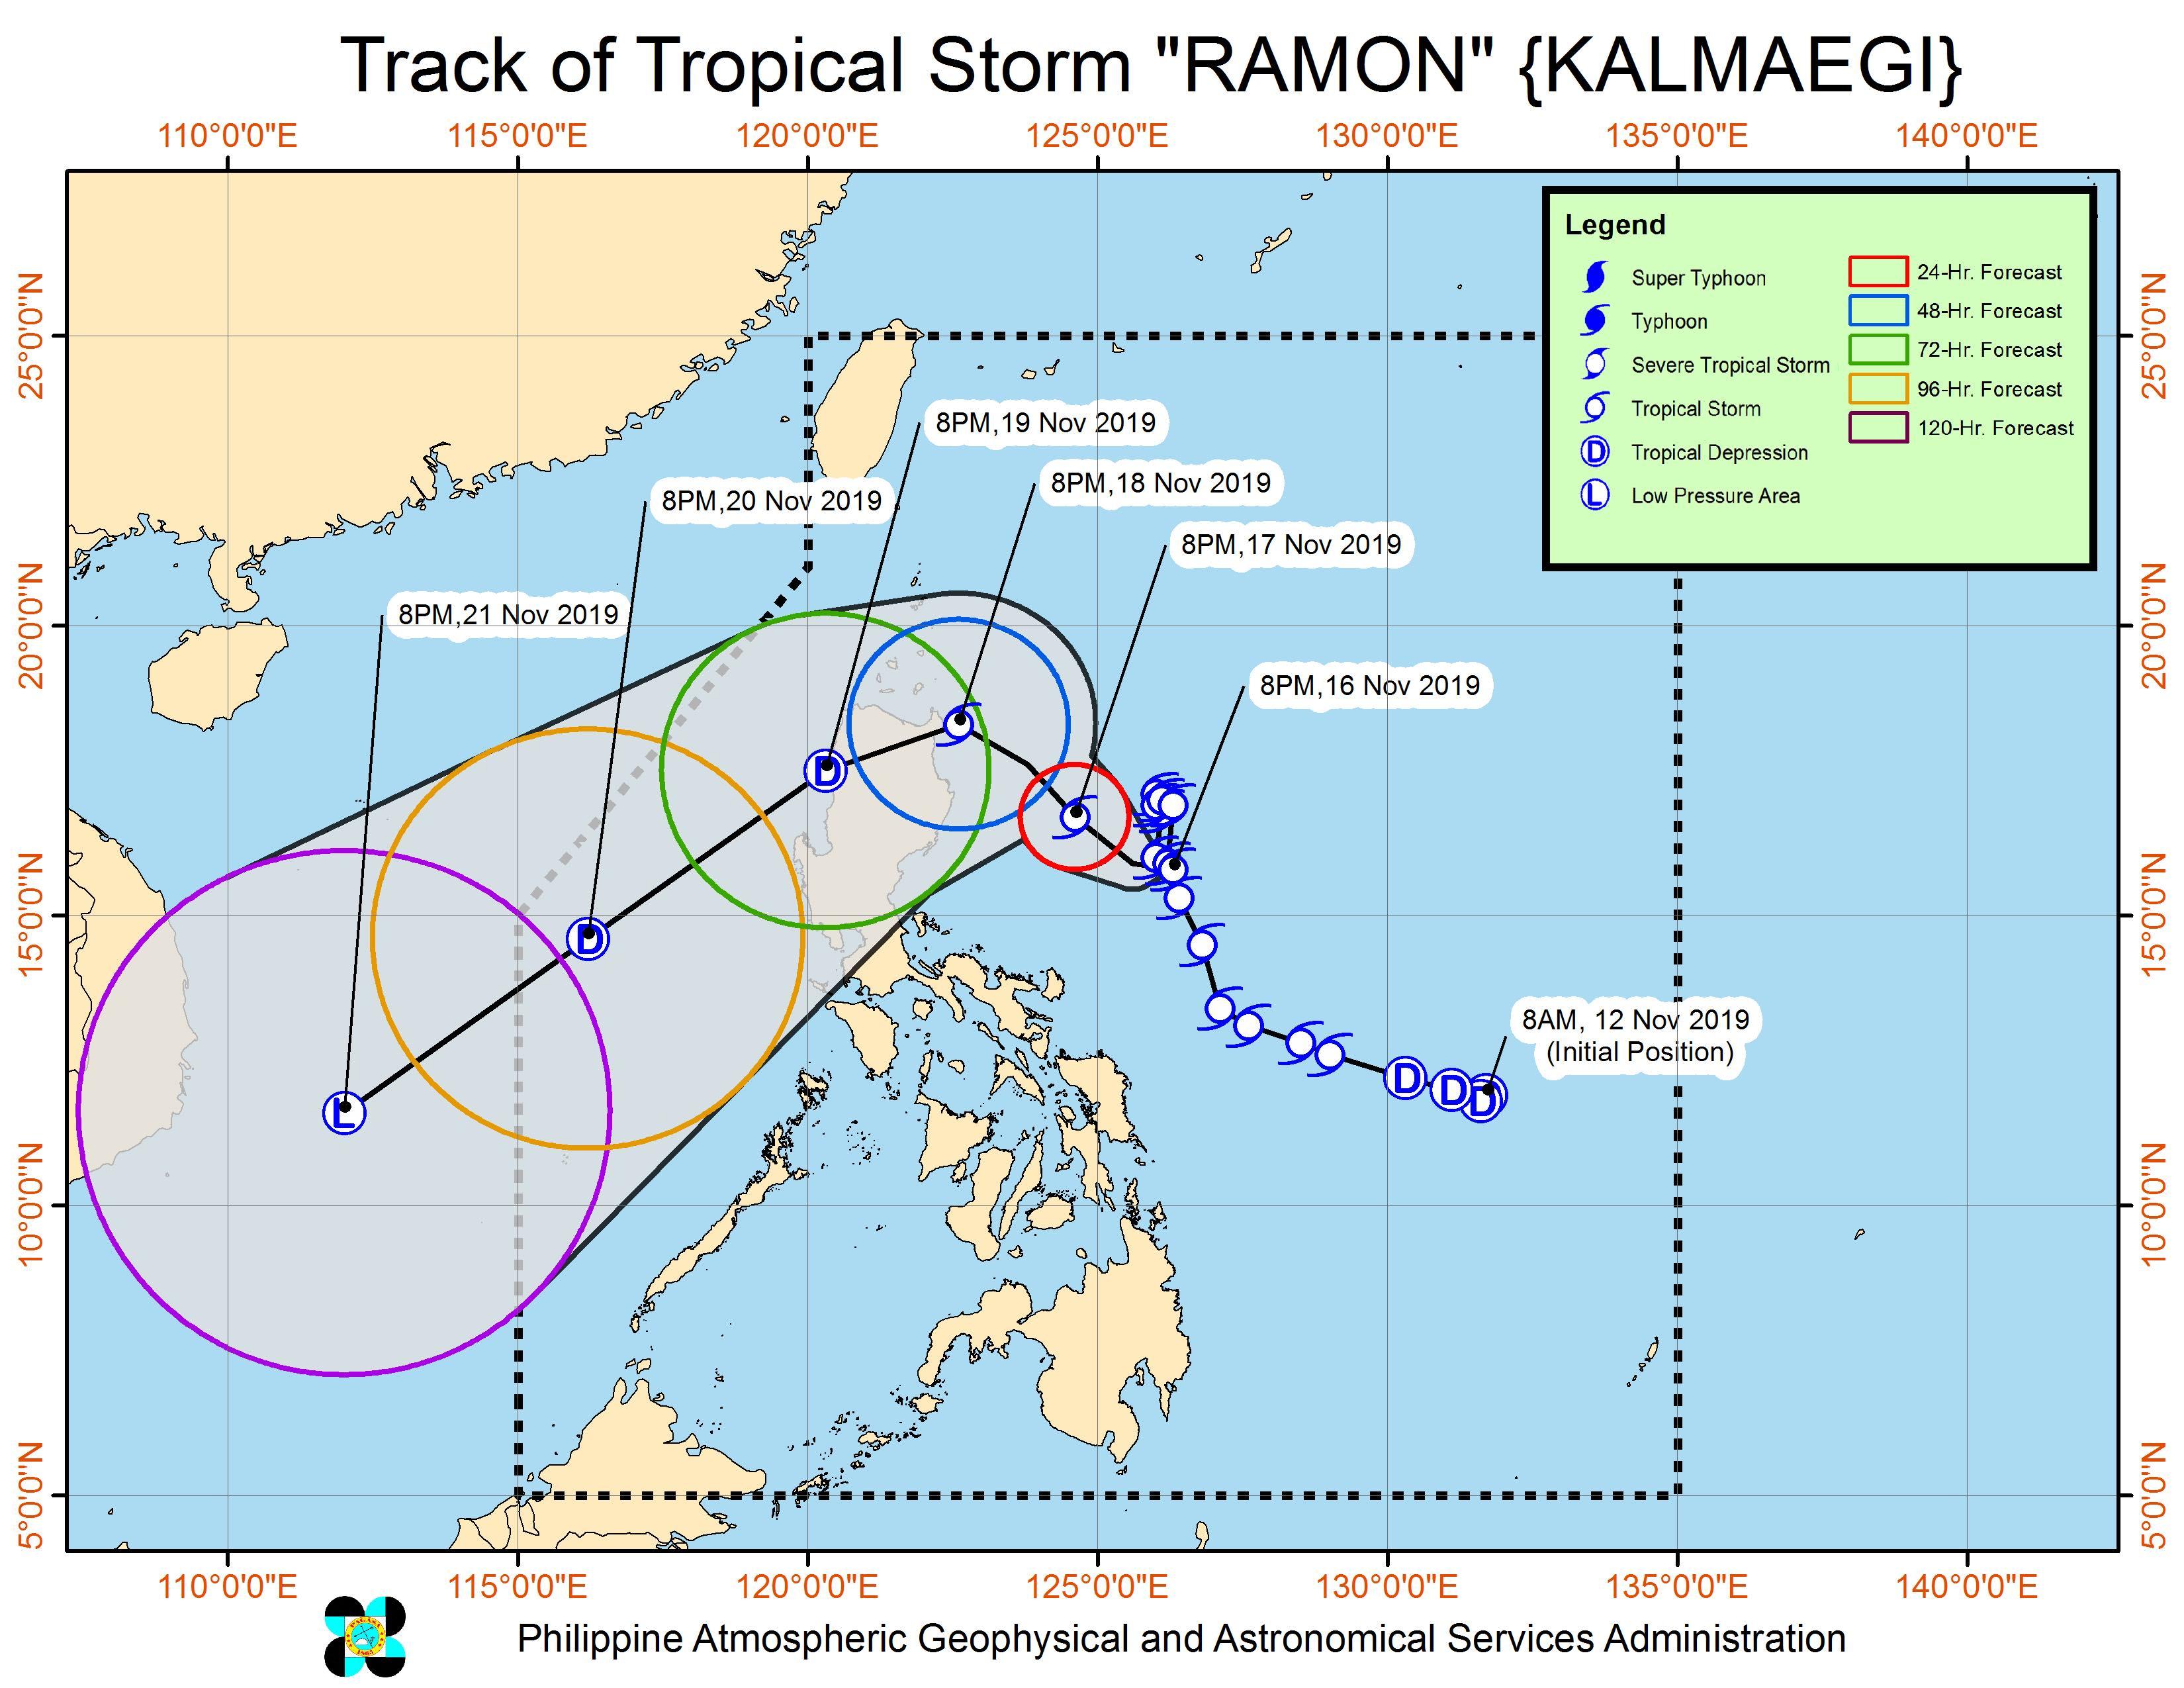 Forecast track of Tropical Storm Ramon (Kalmaegi) as of November 16, 2019, 11 pm. Image from PAGASA